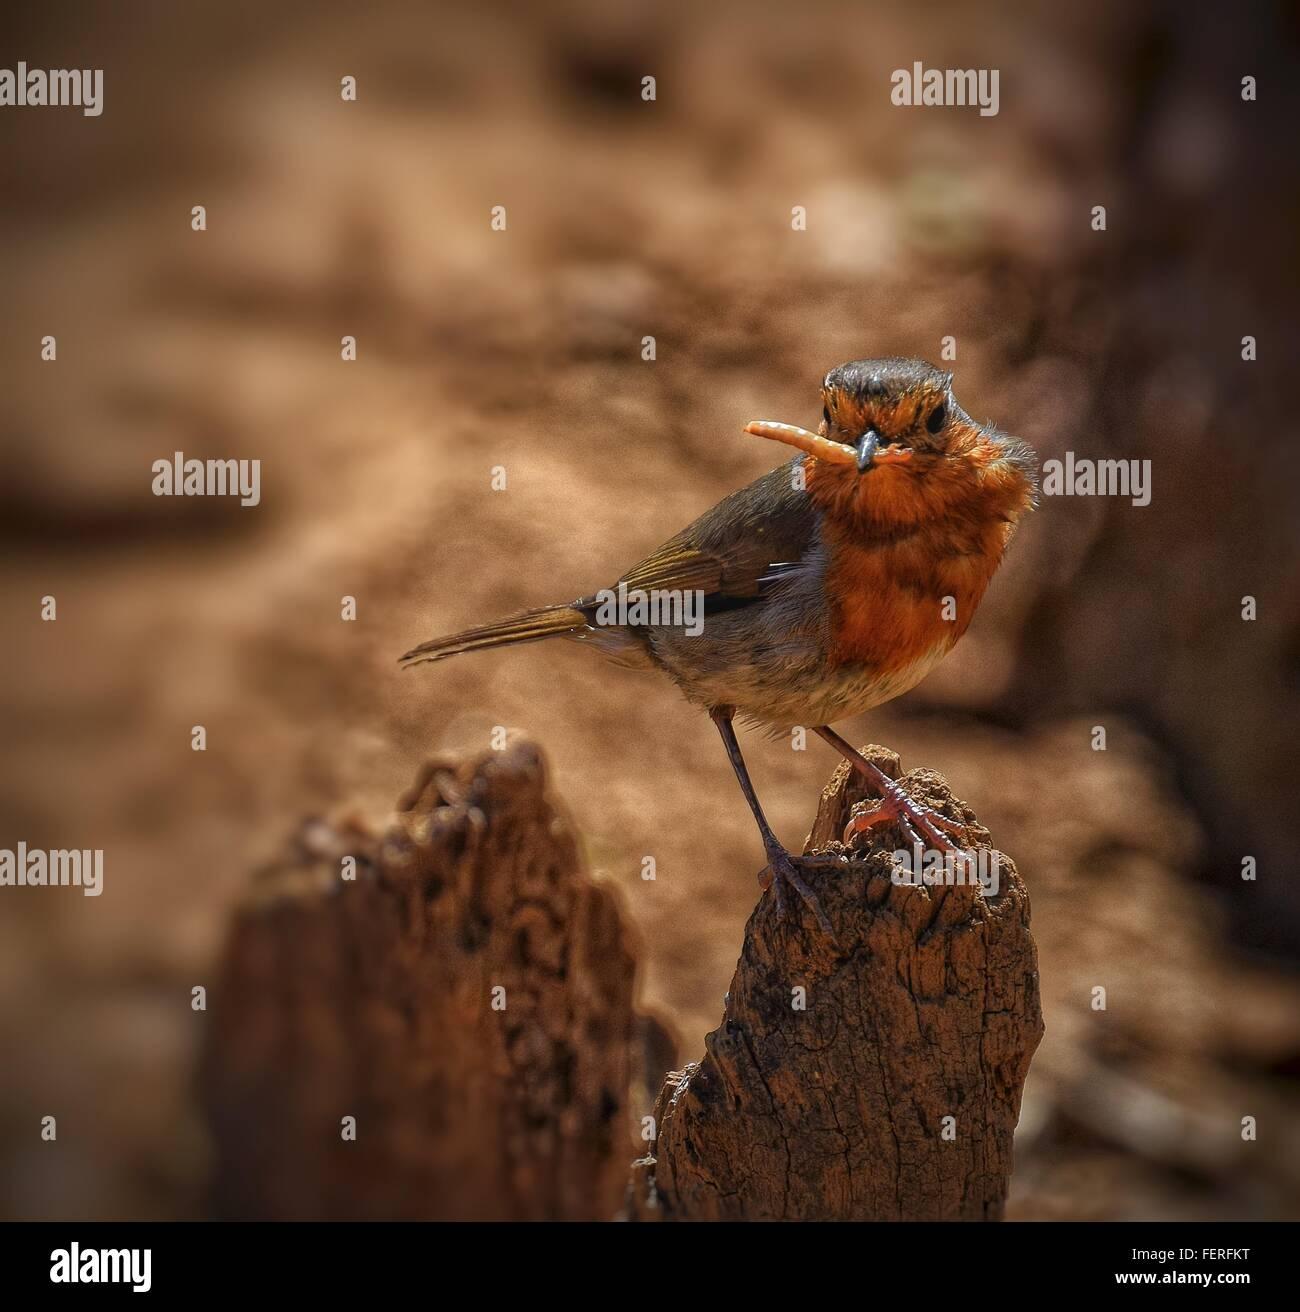 Bird Perching On Tree Trunk - Stock Image